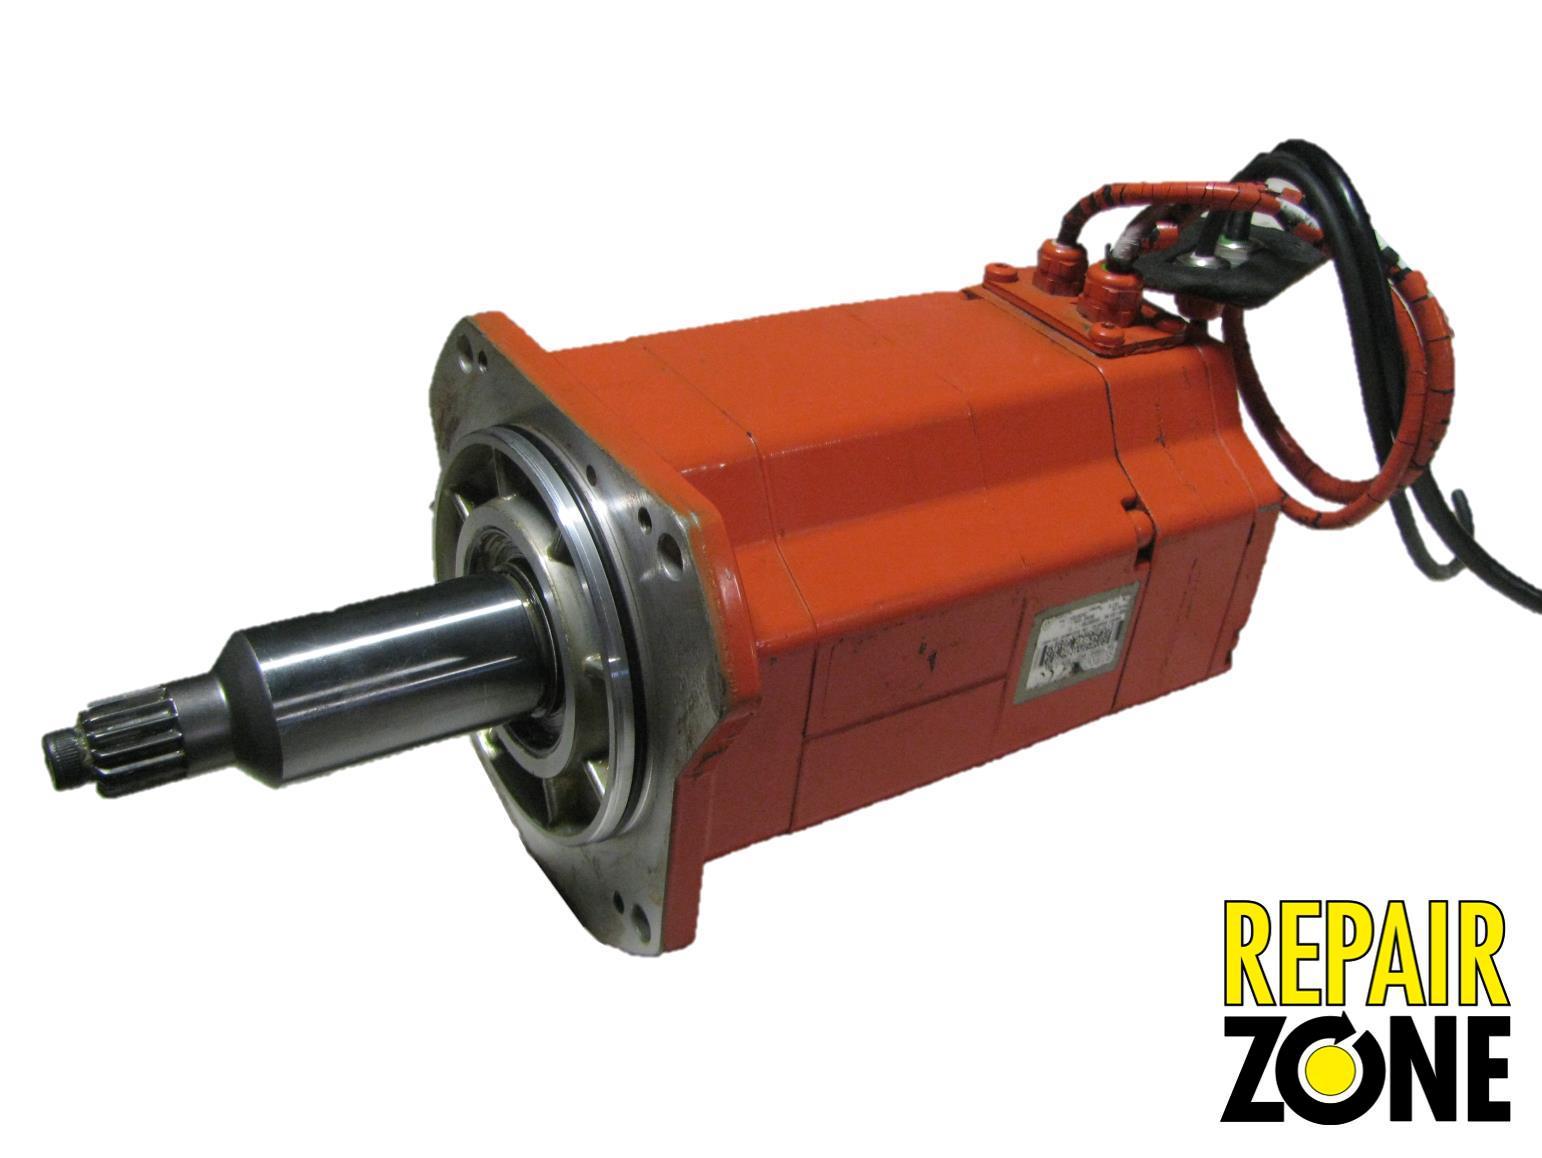 1ft6064 6wf71 4sa0 Siemens Servo Motors Remanufactured Ebay